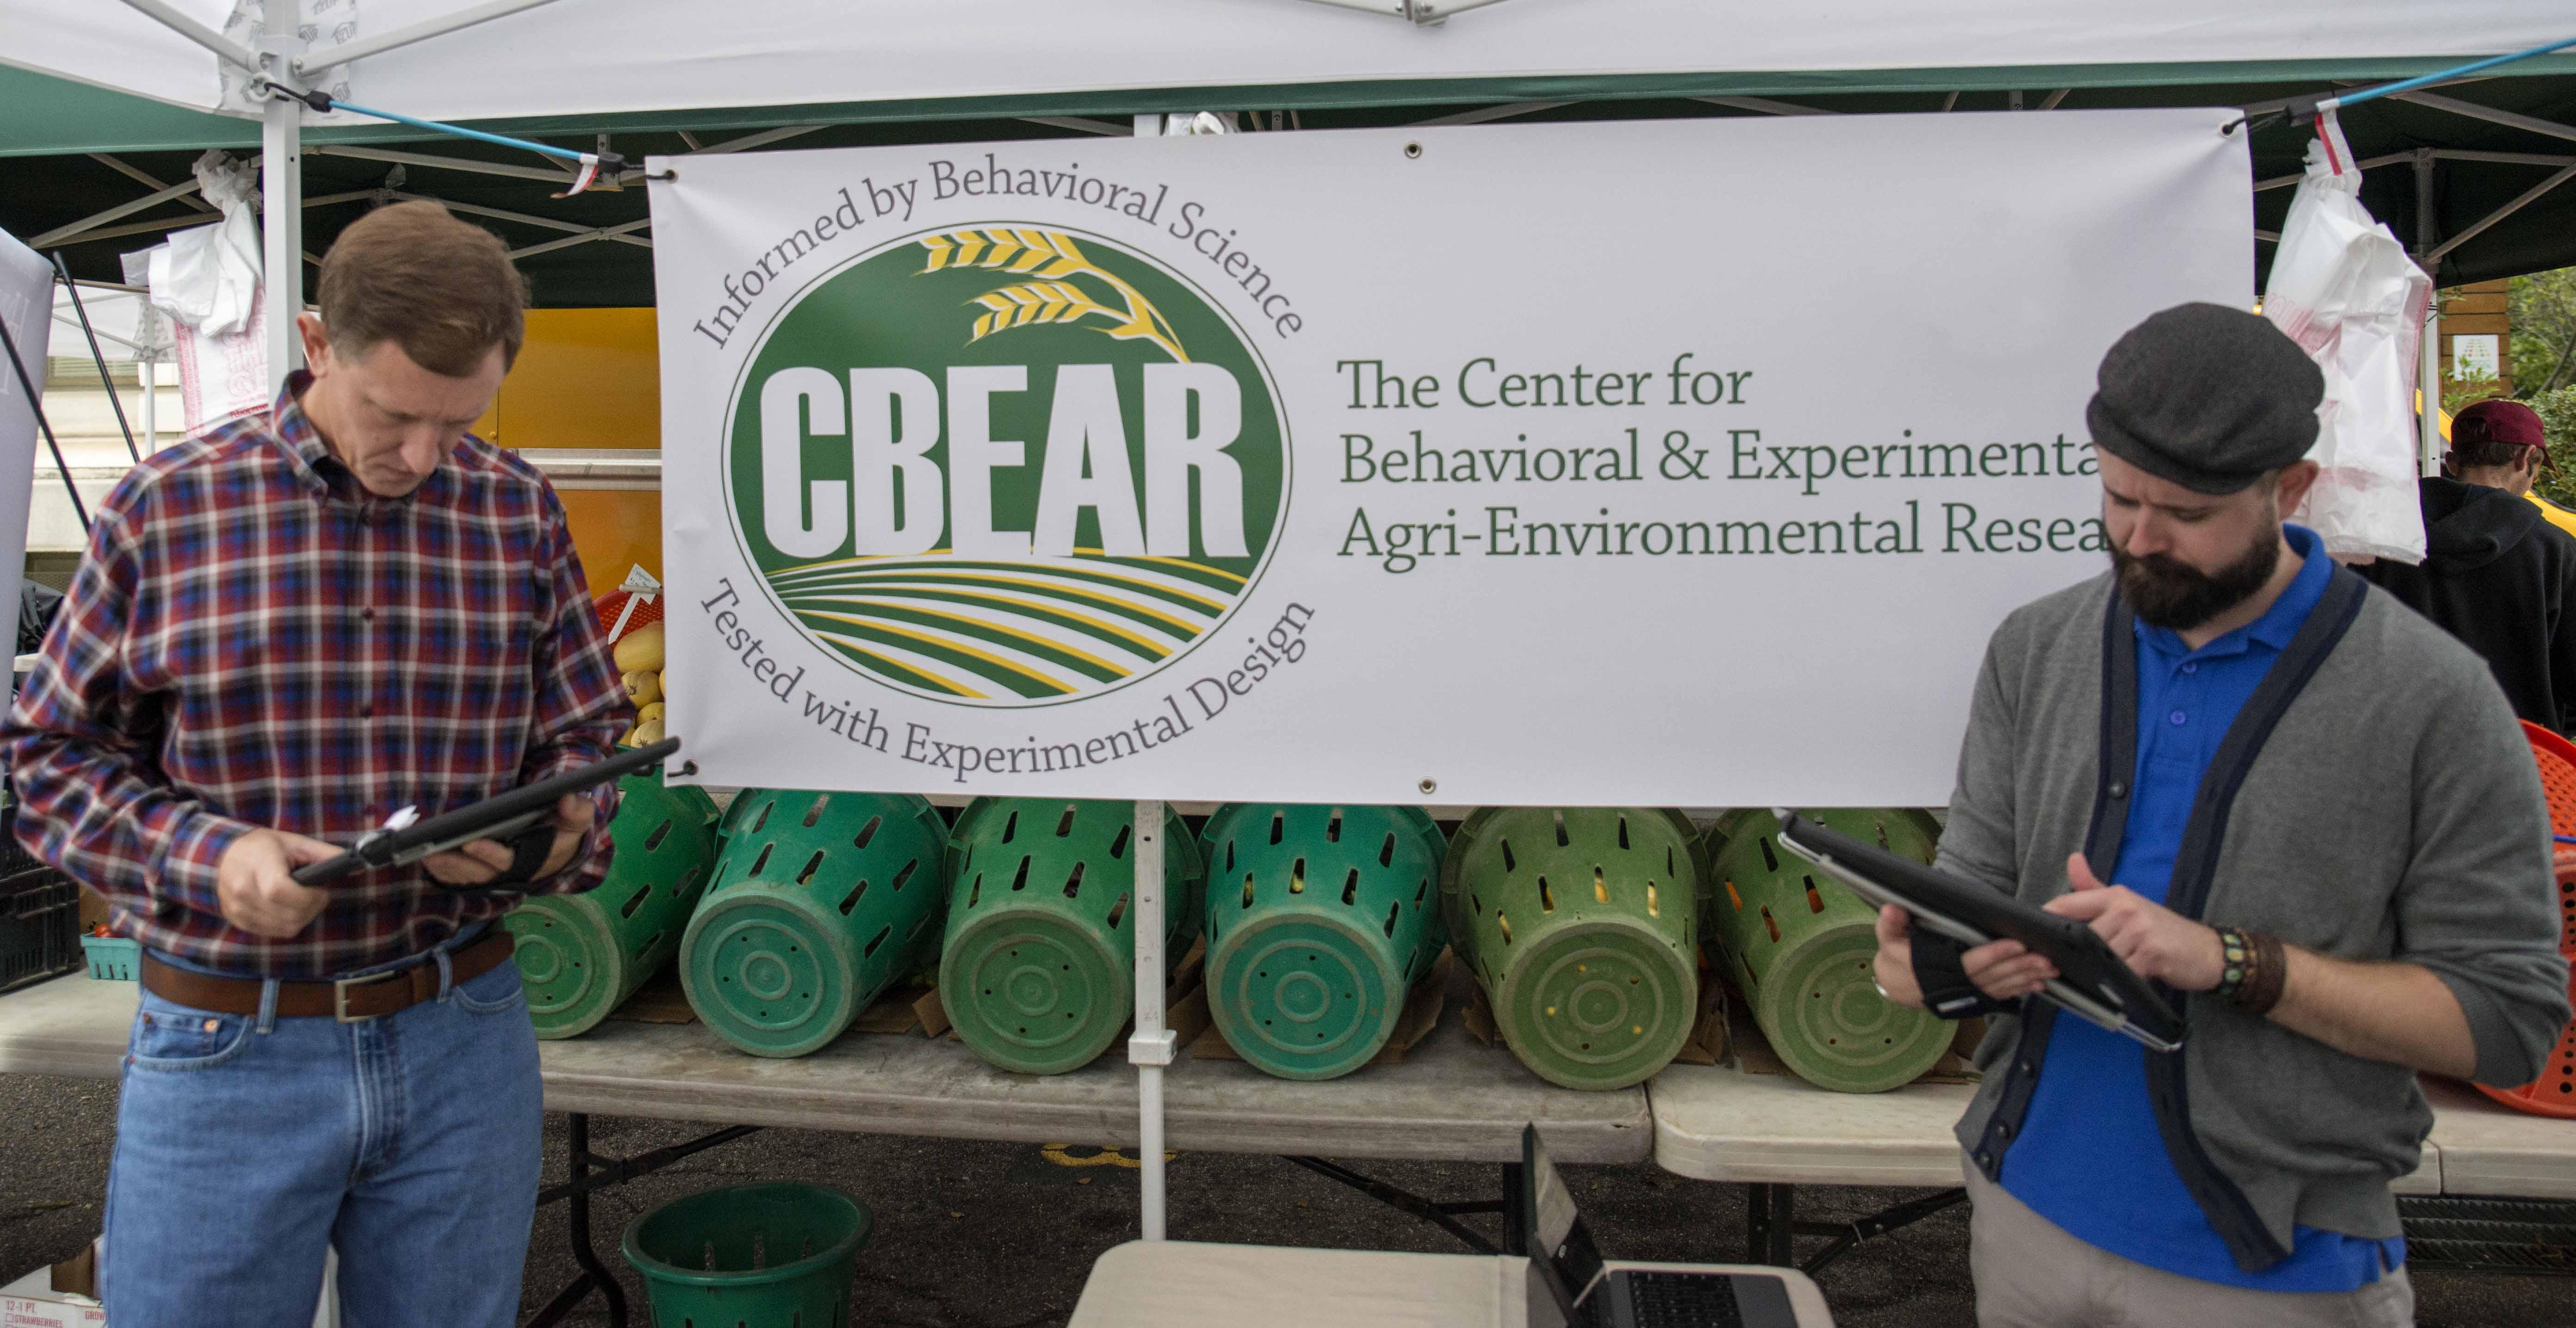 USDA Farmers Market - CBEAR